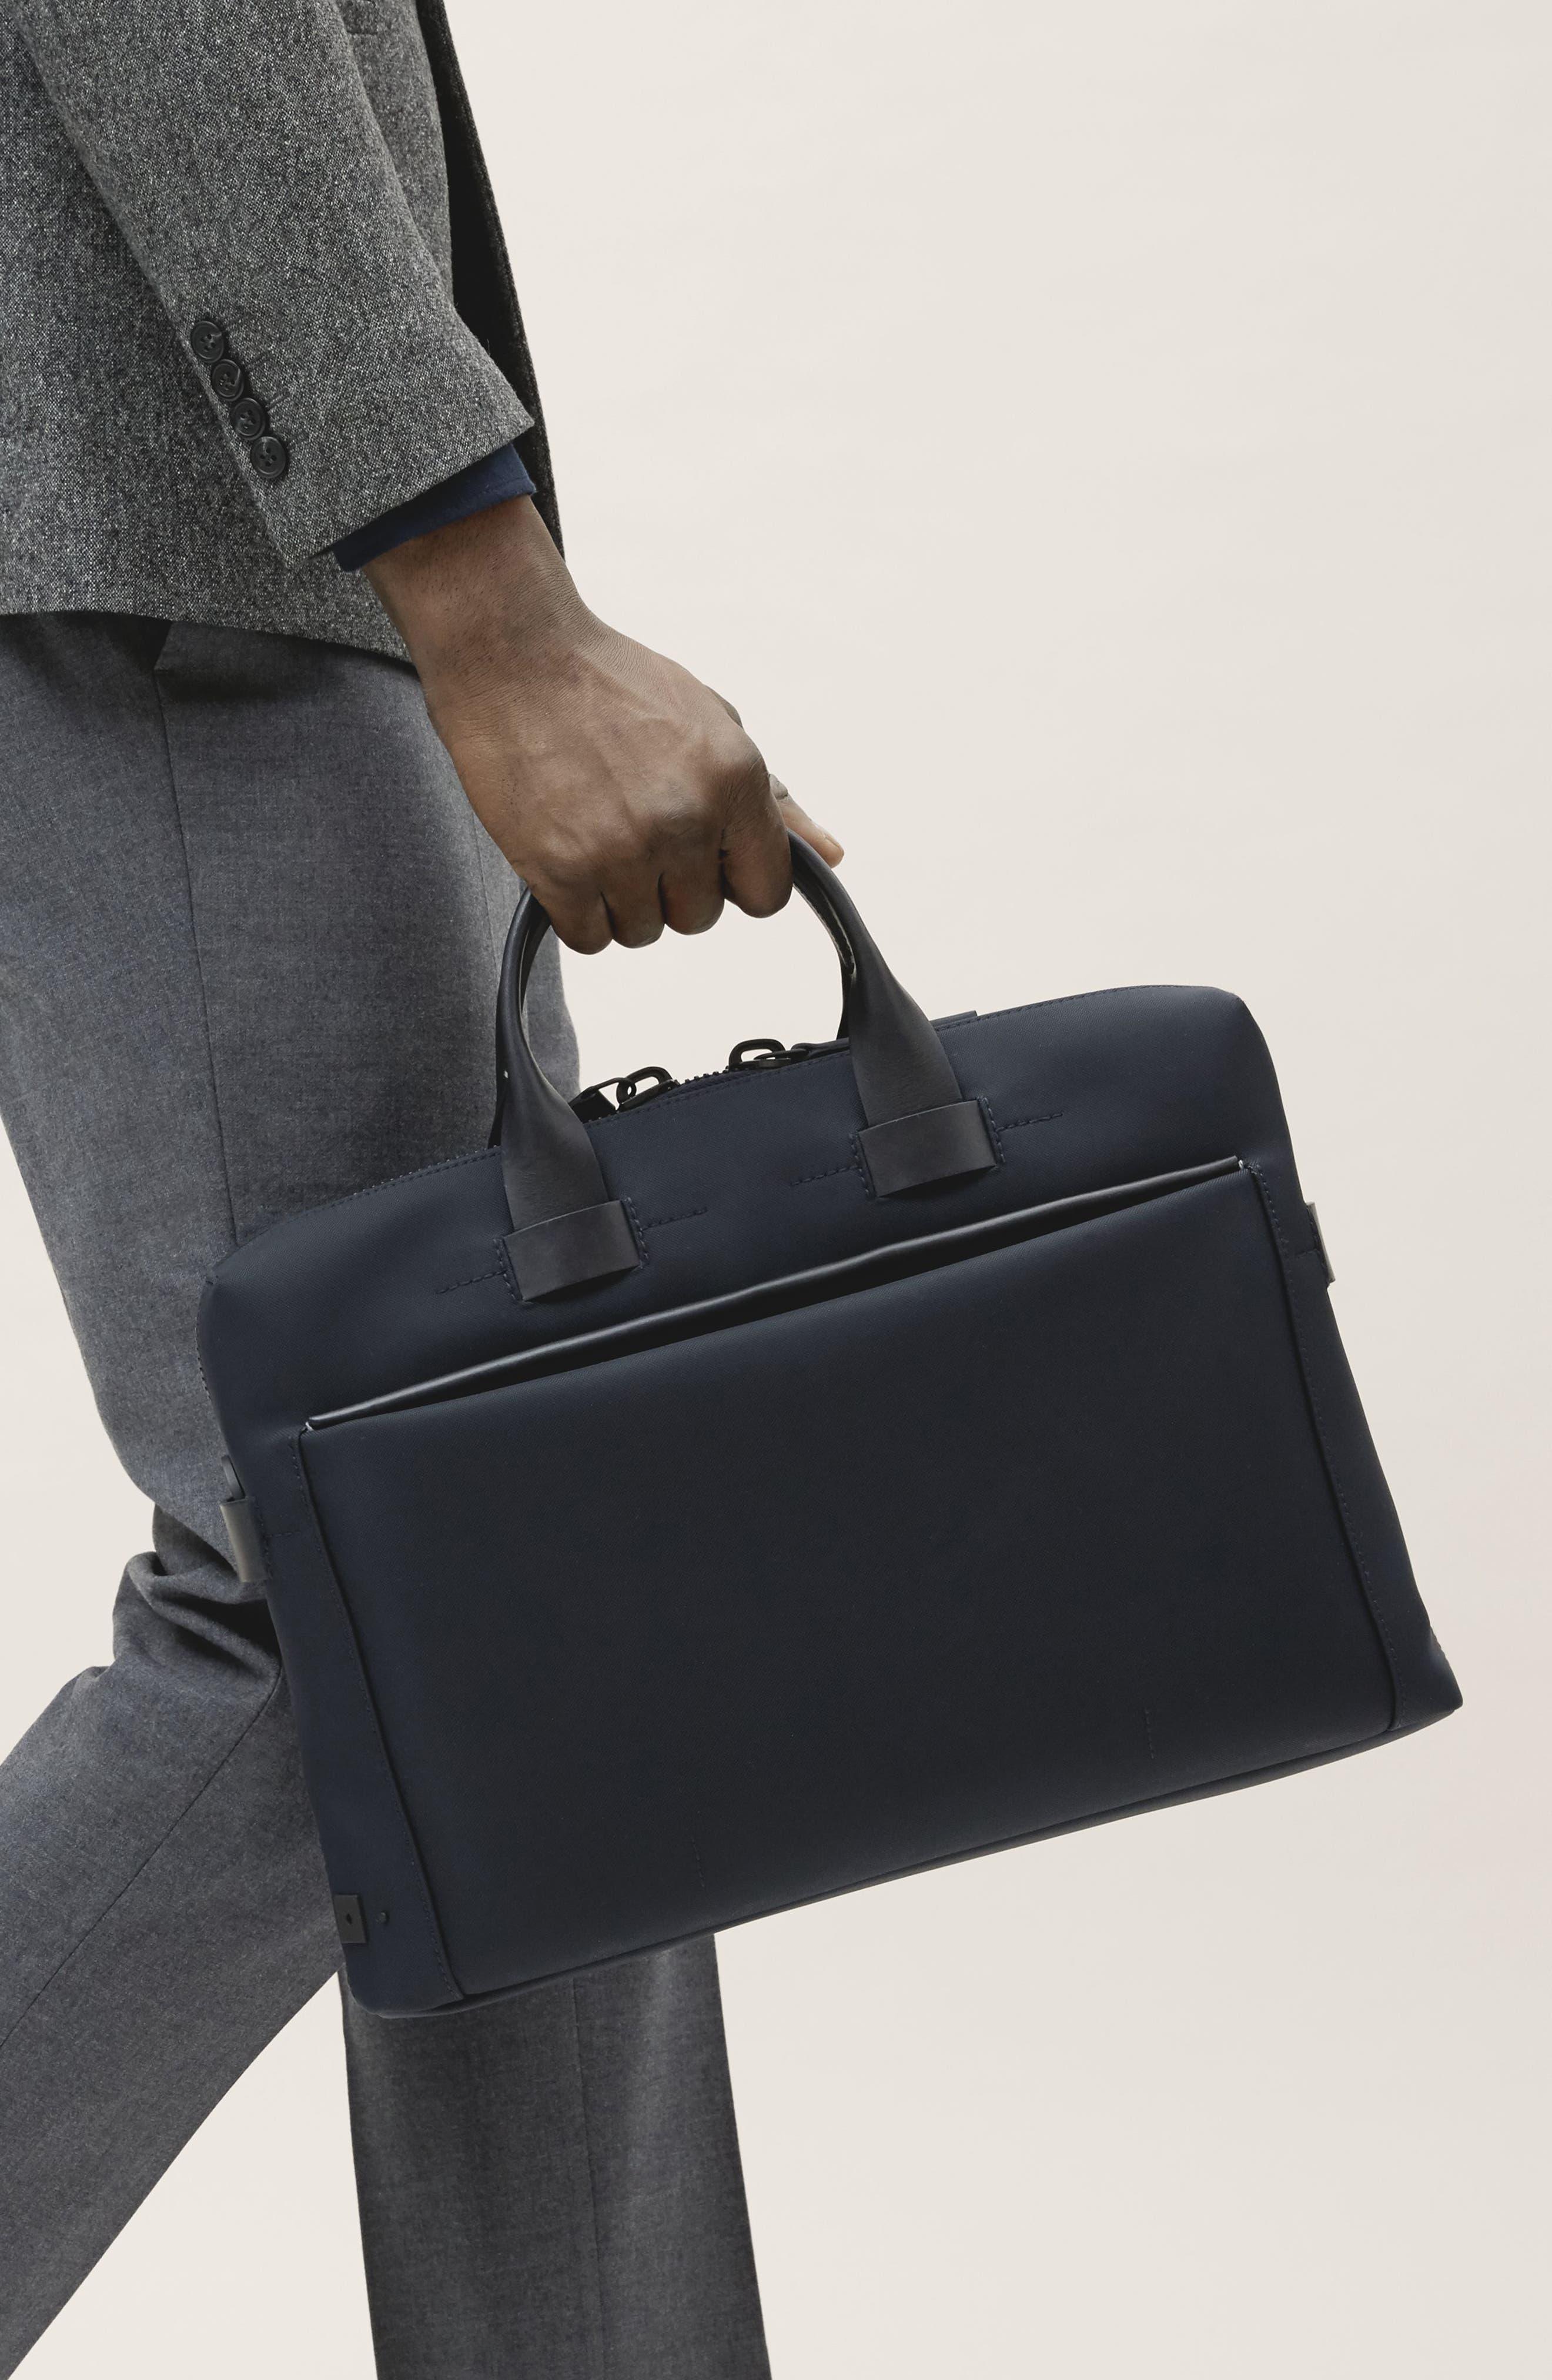 Slim Briefcase,                             Alternate thumbnail 2, color,                             NAVY NYLON/ NAVY LEATHER